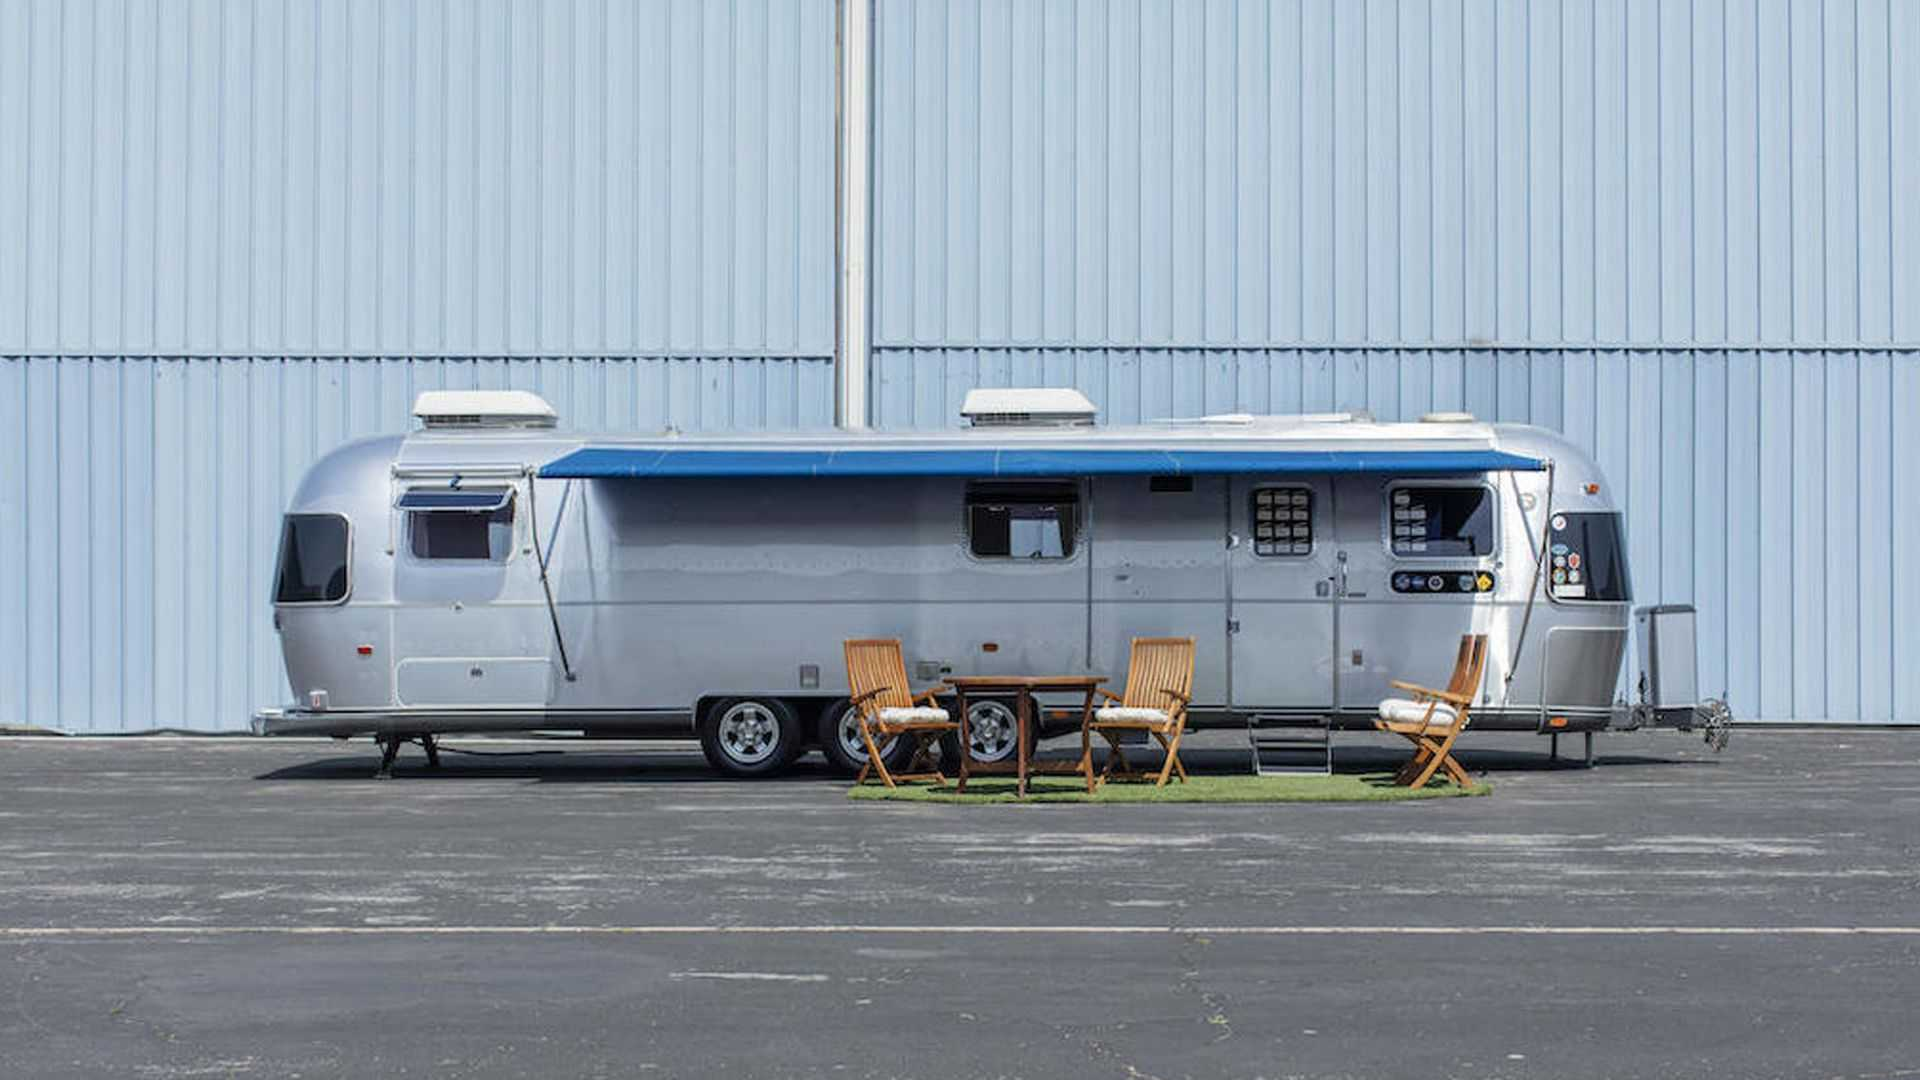 Tom-Hanks-Airstream-trailer-for-sale-2